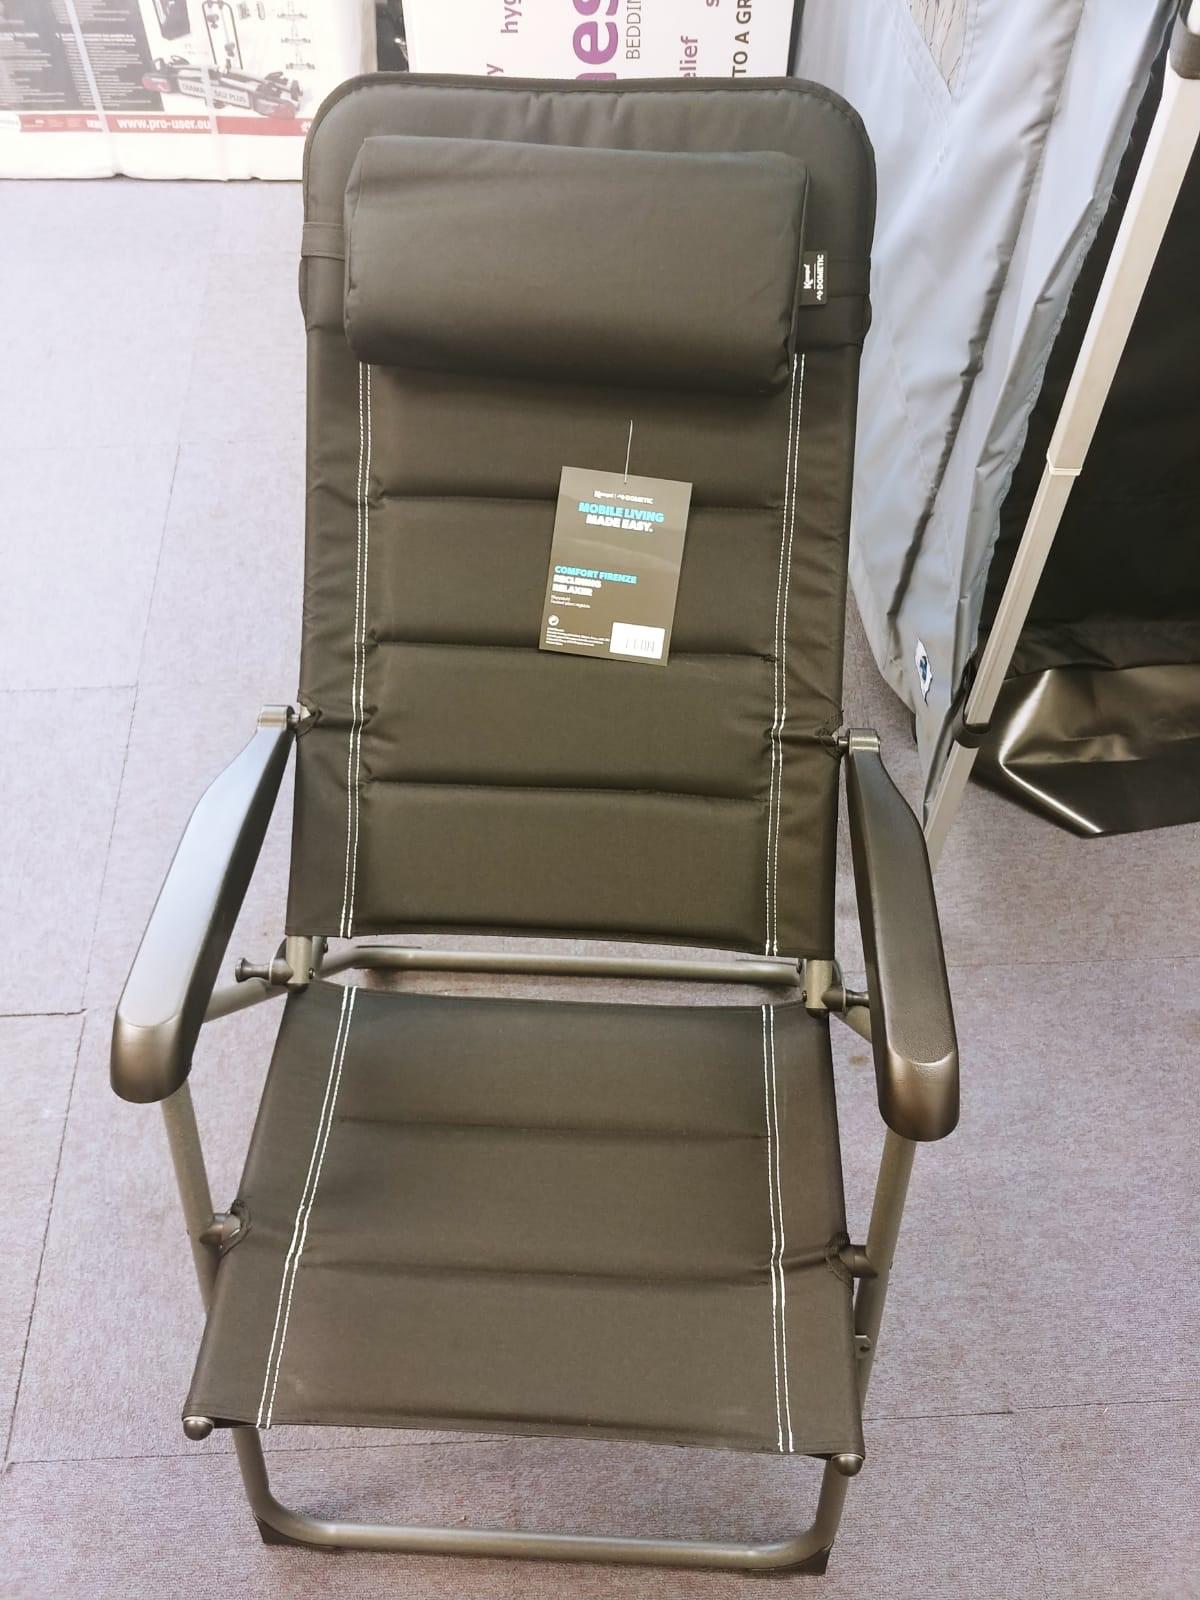 Kampa Dometic Comfort Firenze Recliner Chair